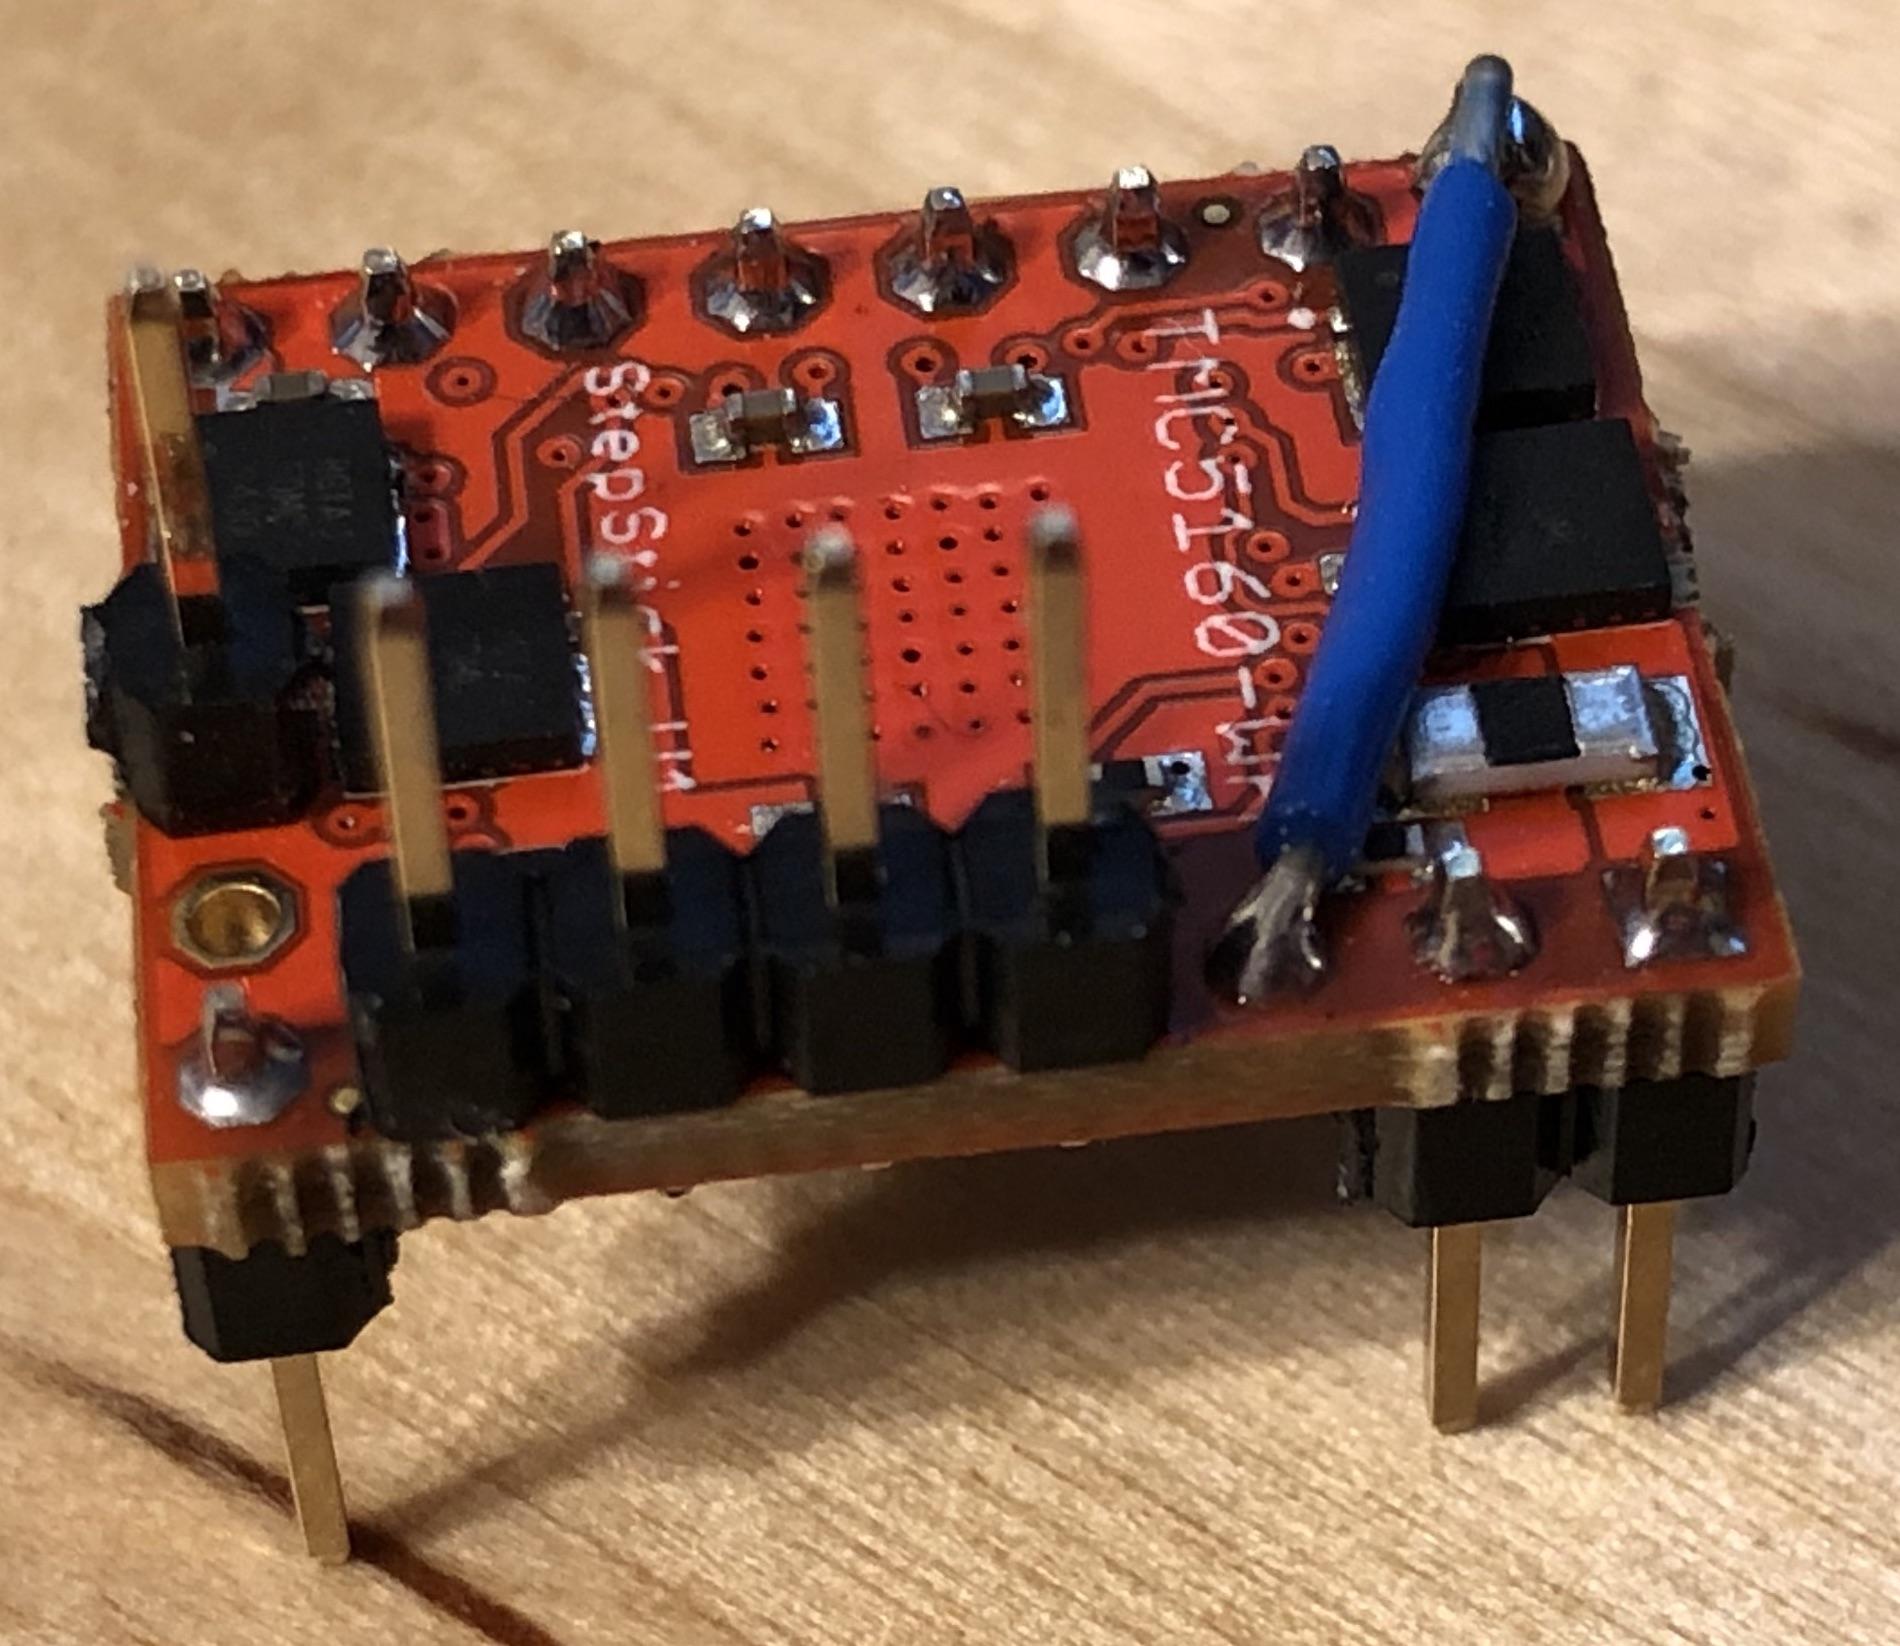 BUG] [bugfix-2 0 x] TMC5160 SD card unmounts and encoder